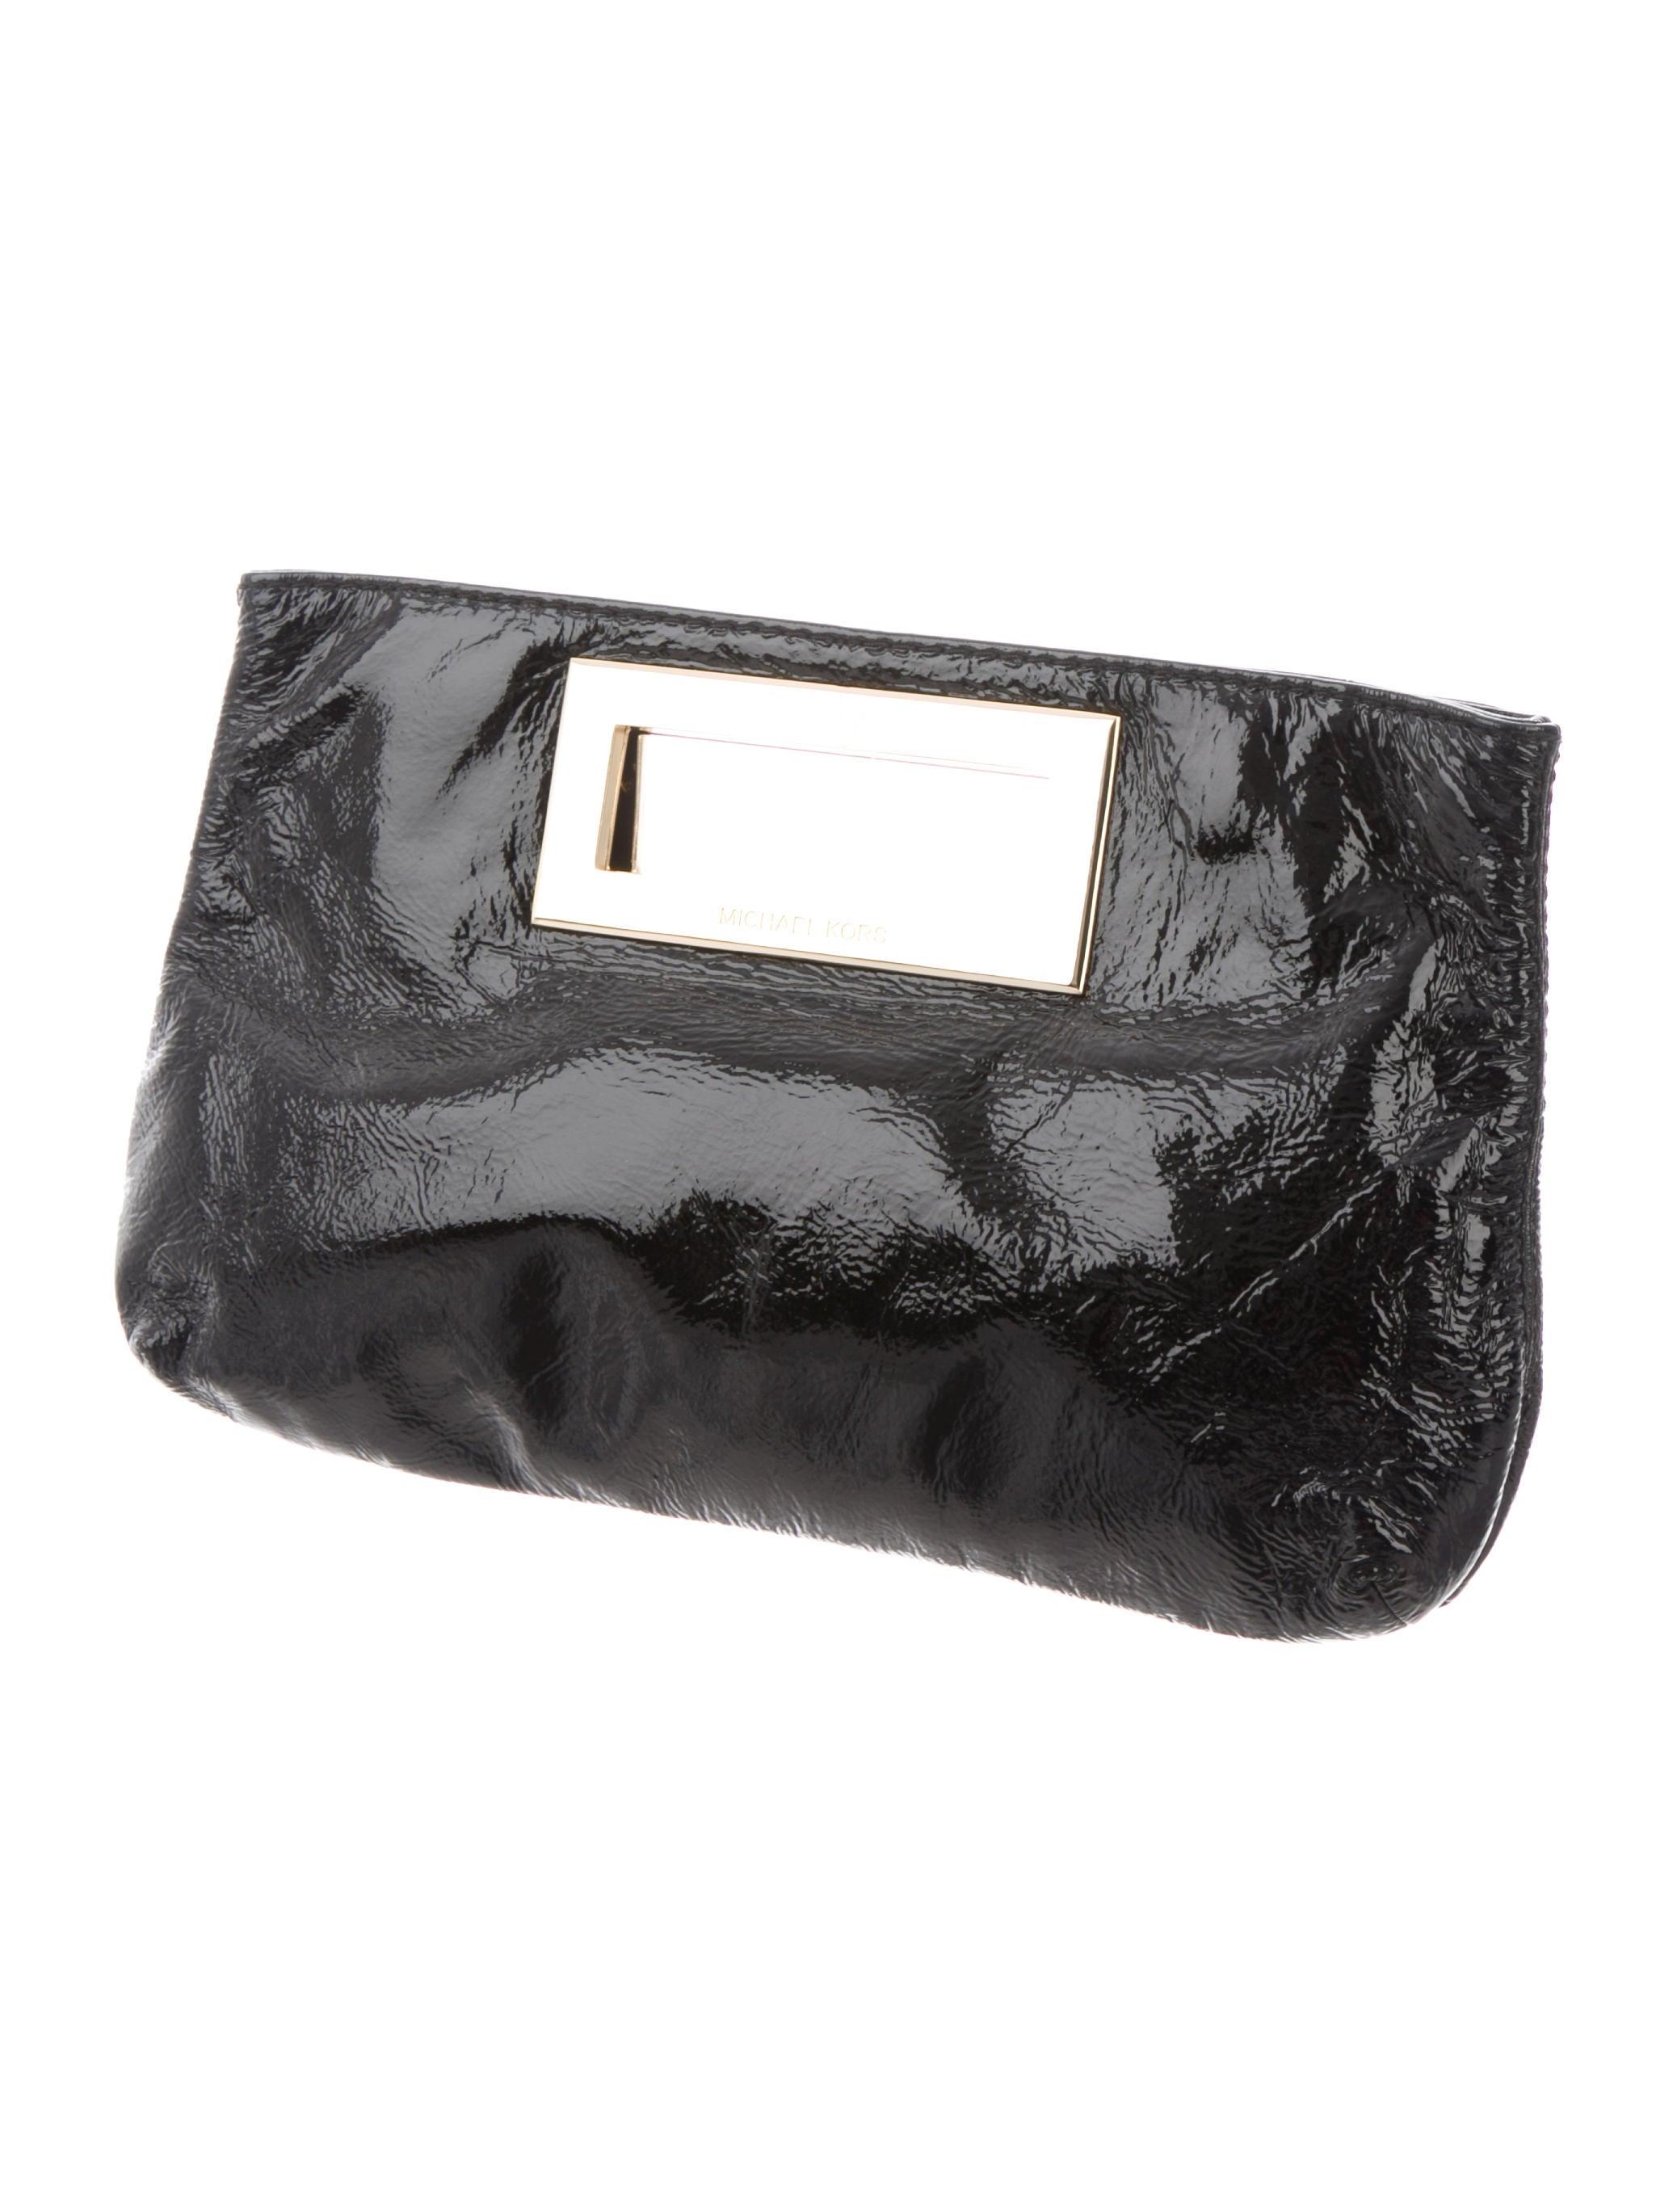 Michael Kors Patent Leather Purse - Best Purse Image Ccdbb.Org 7c86bfb38